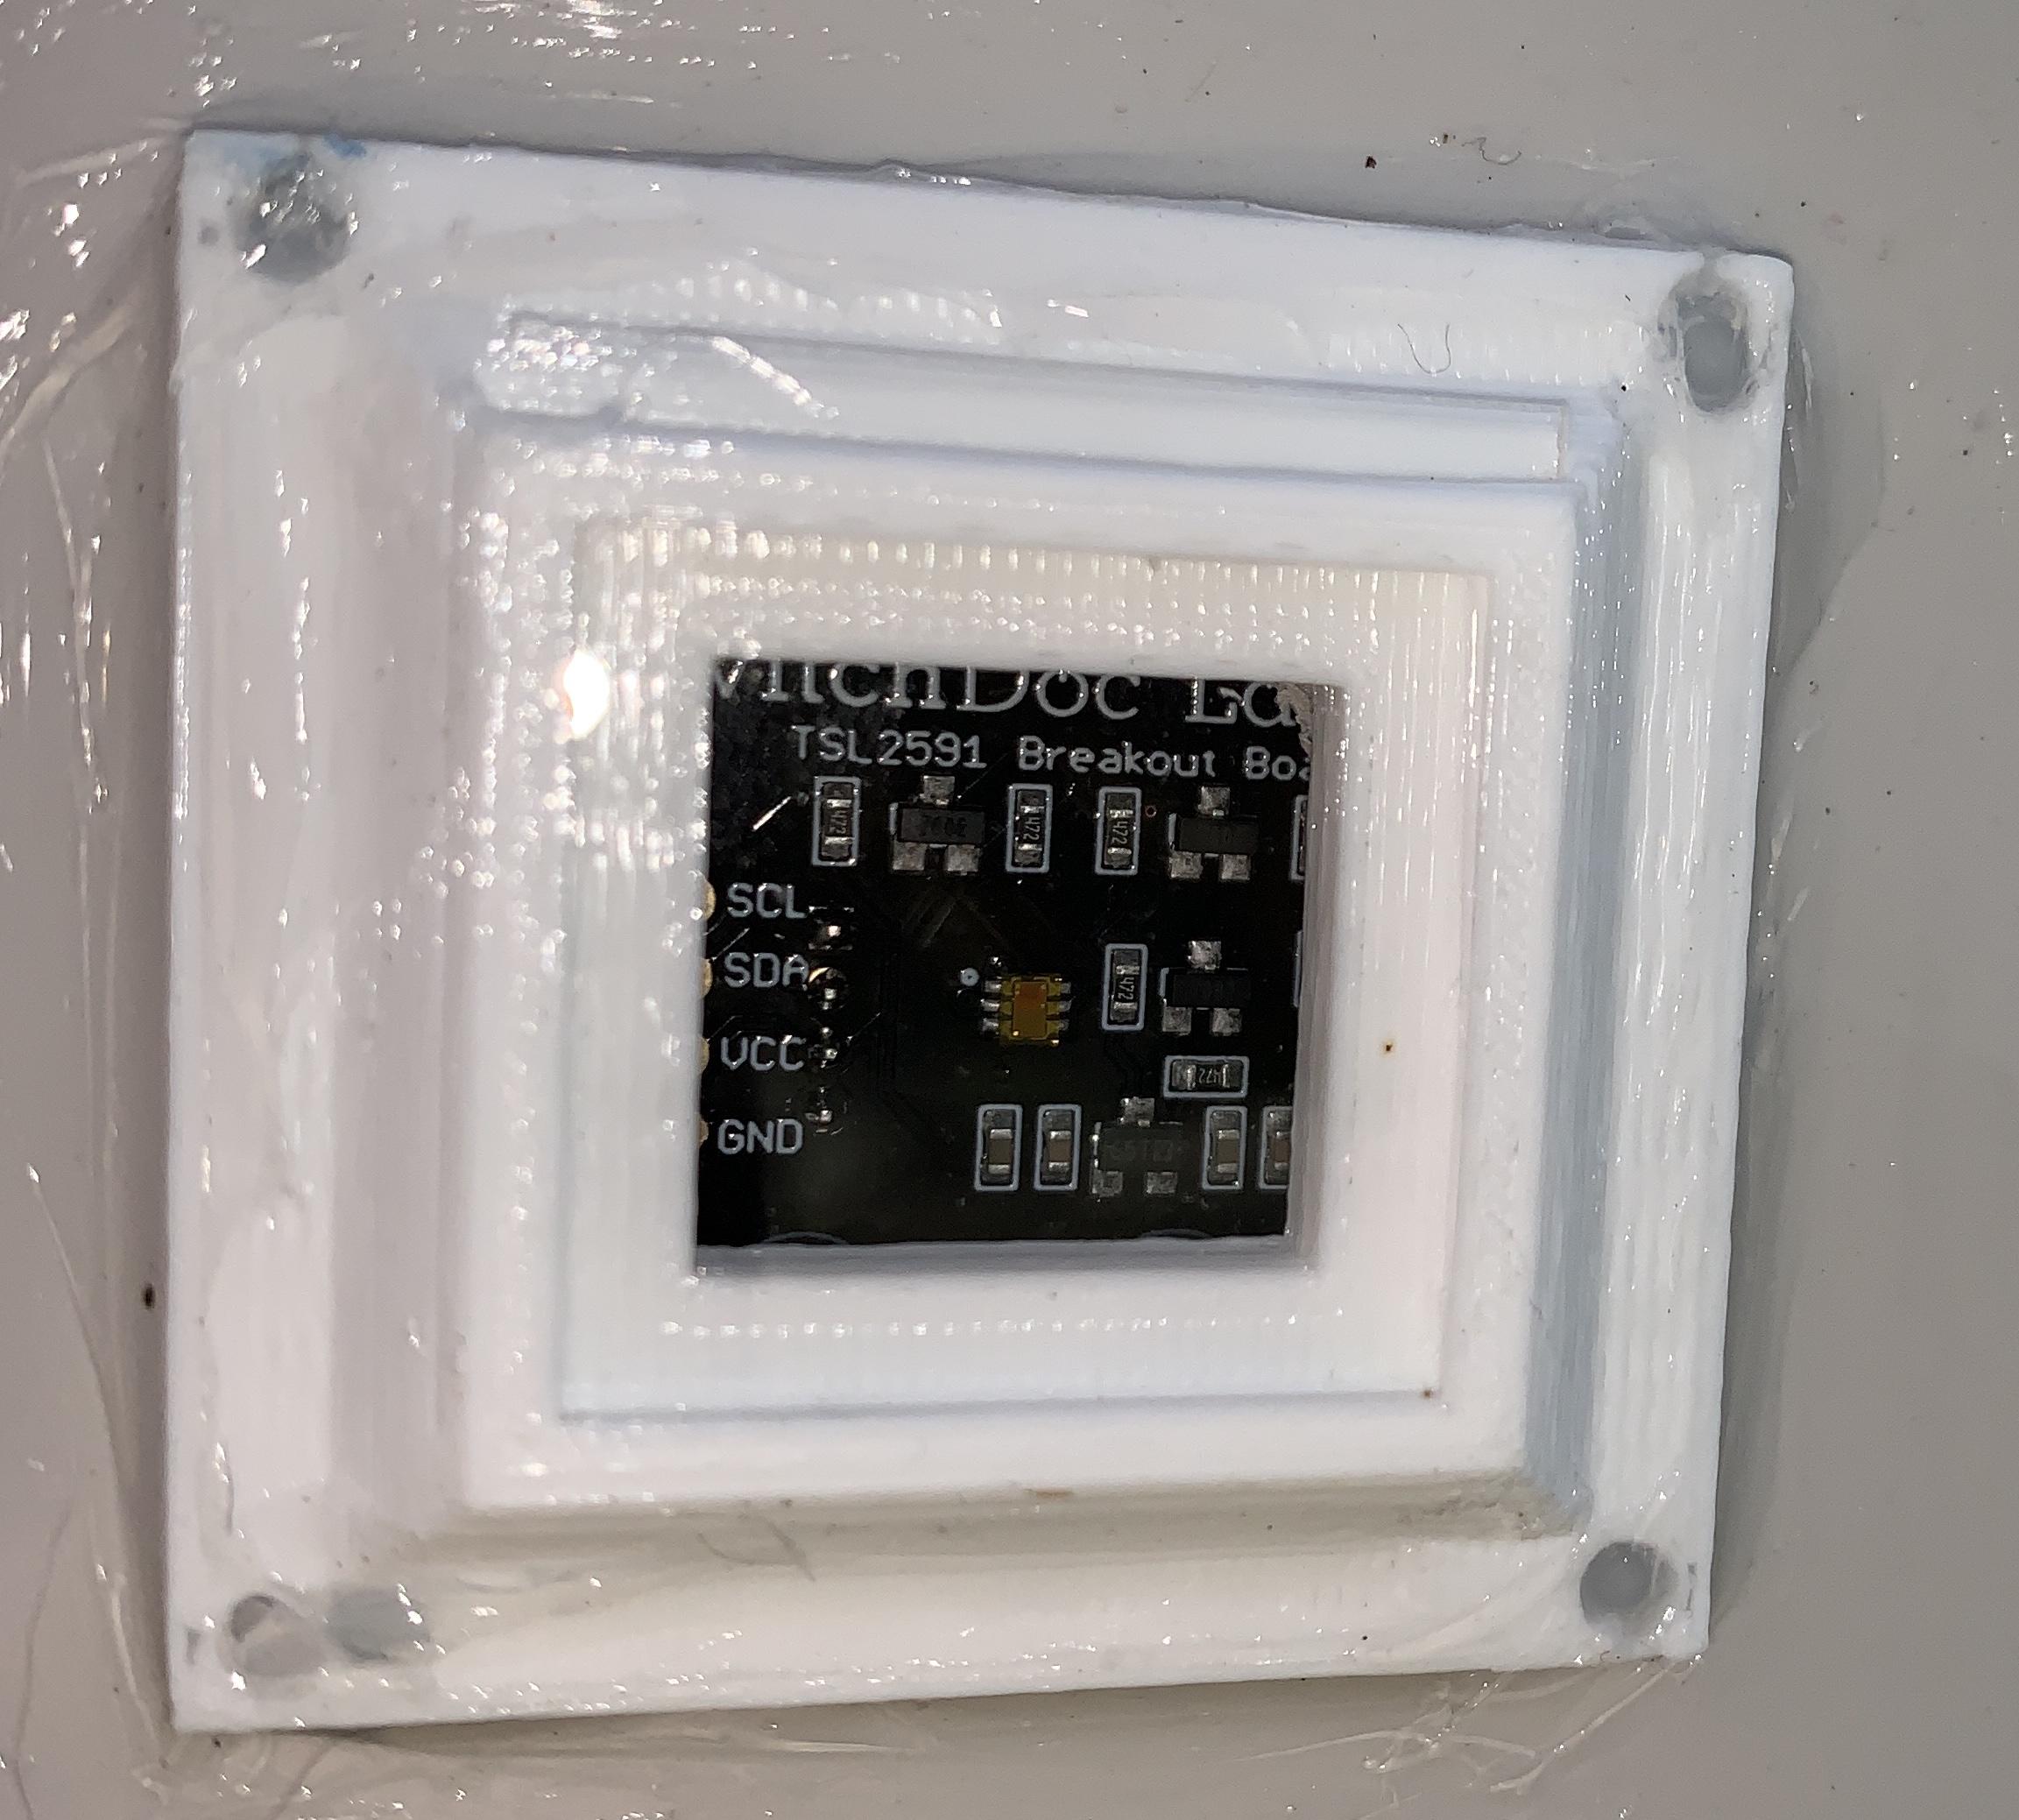 Importerror no module named i2c